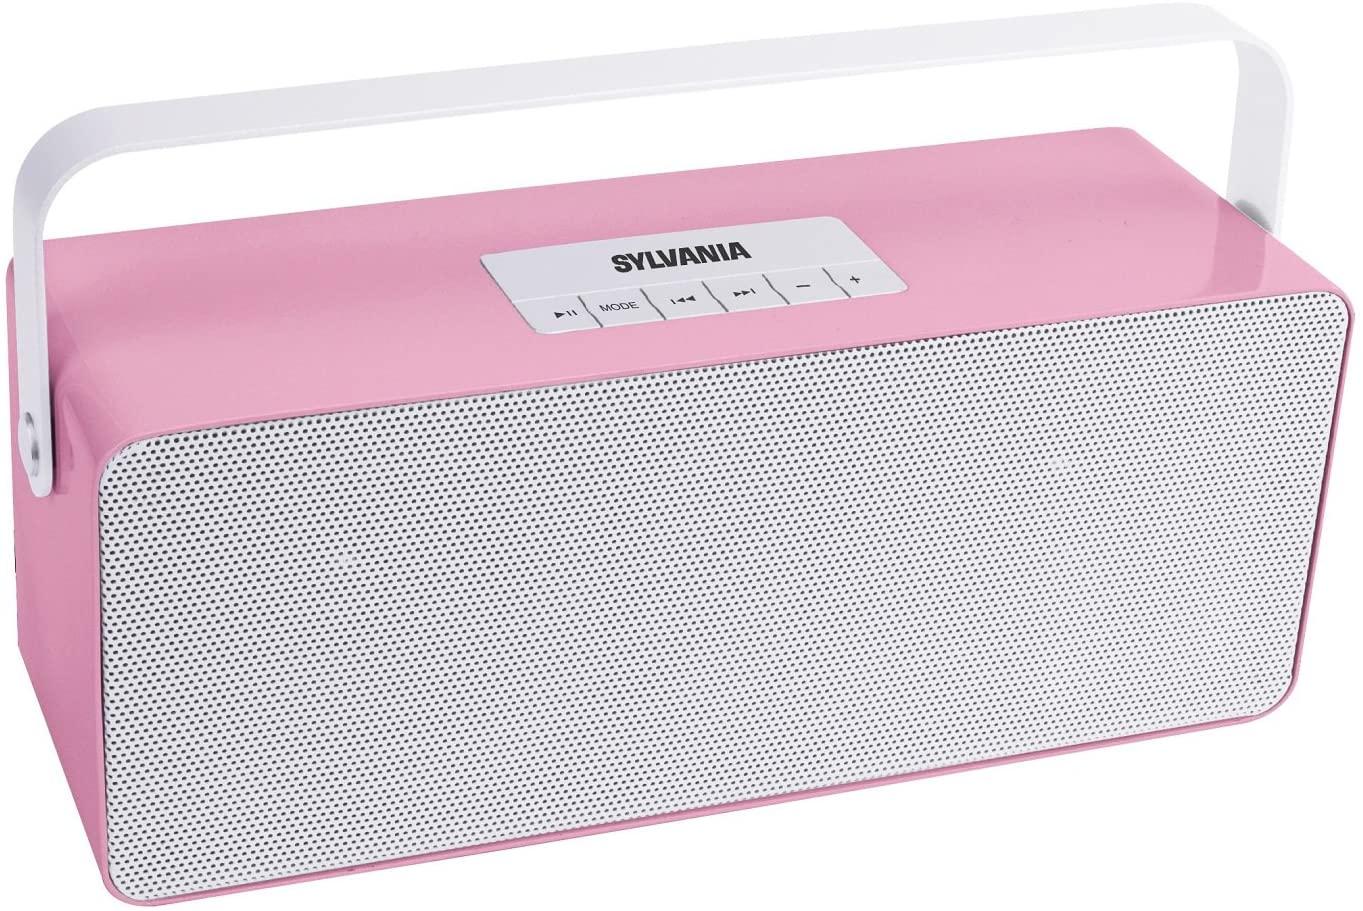 Sylvania SP672 Portable Bluetooth Speaker with Aluminium Handle (Pink)